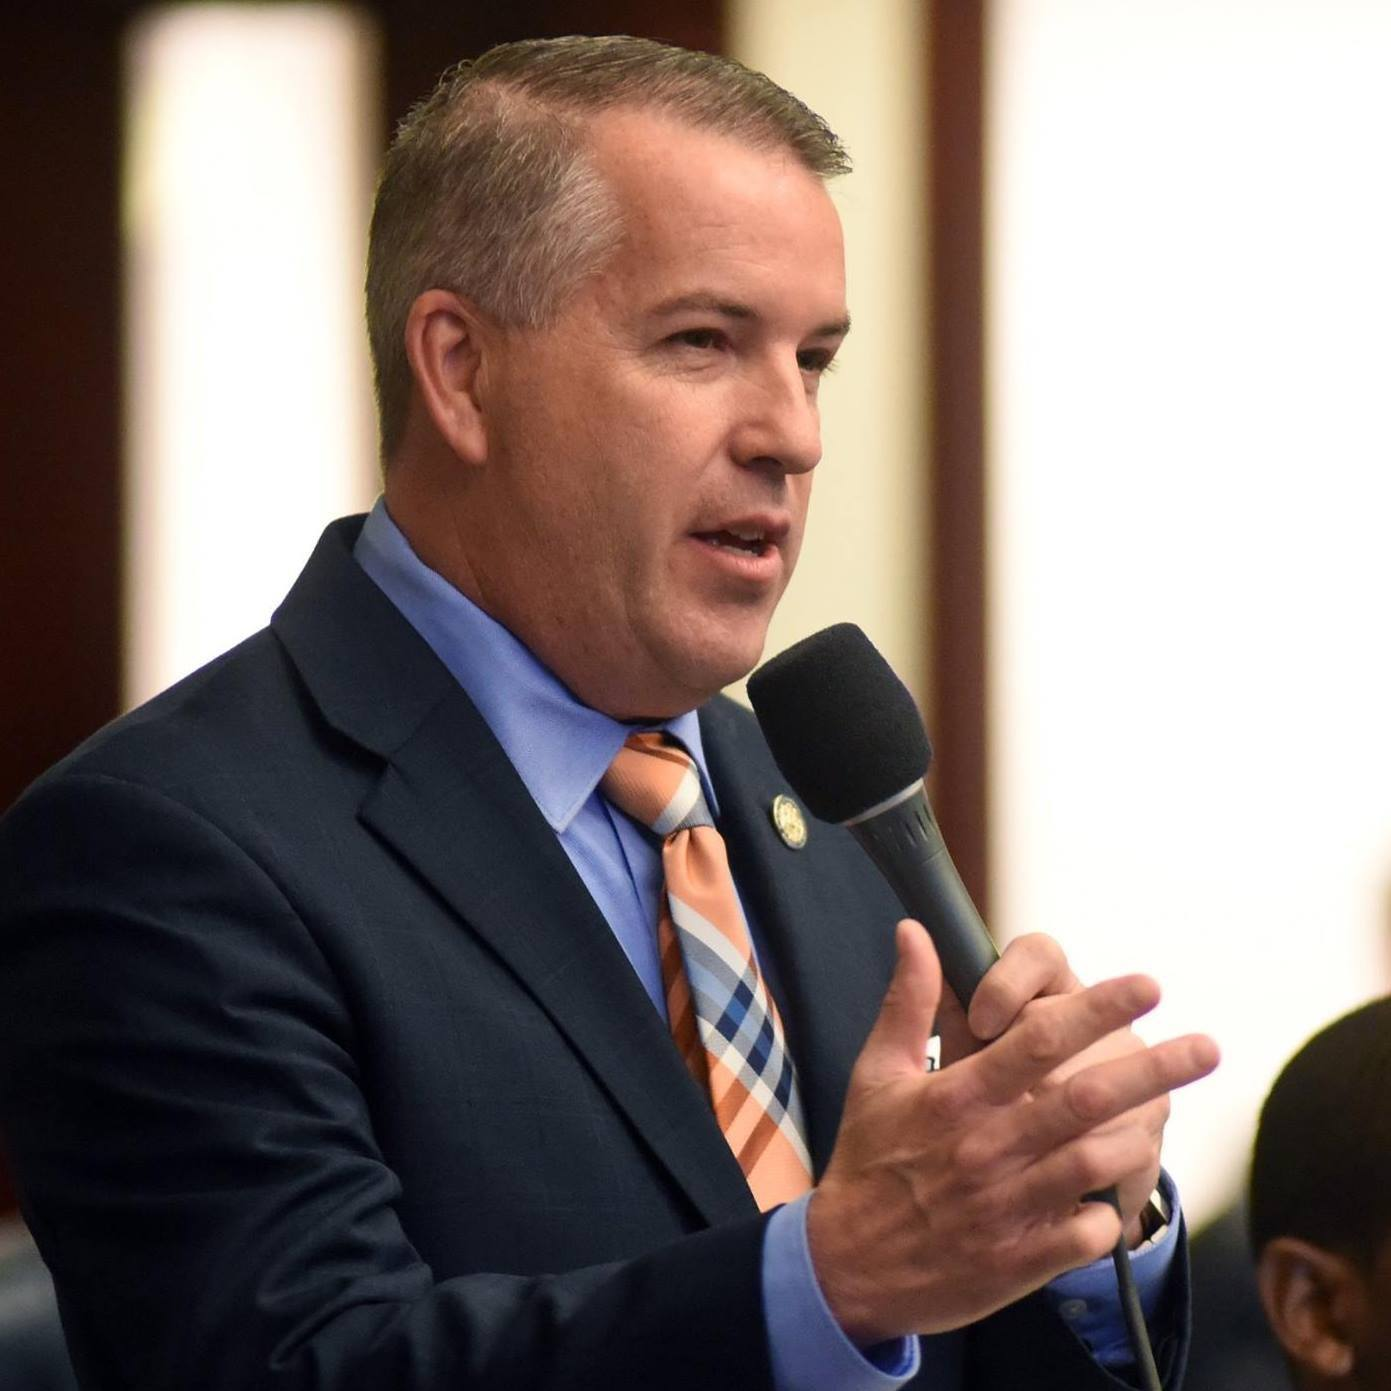 State Rep. Matt Willhite speaks in the Florida State legislature in Tallahassee. Photo courtesy of Florida Politics.